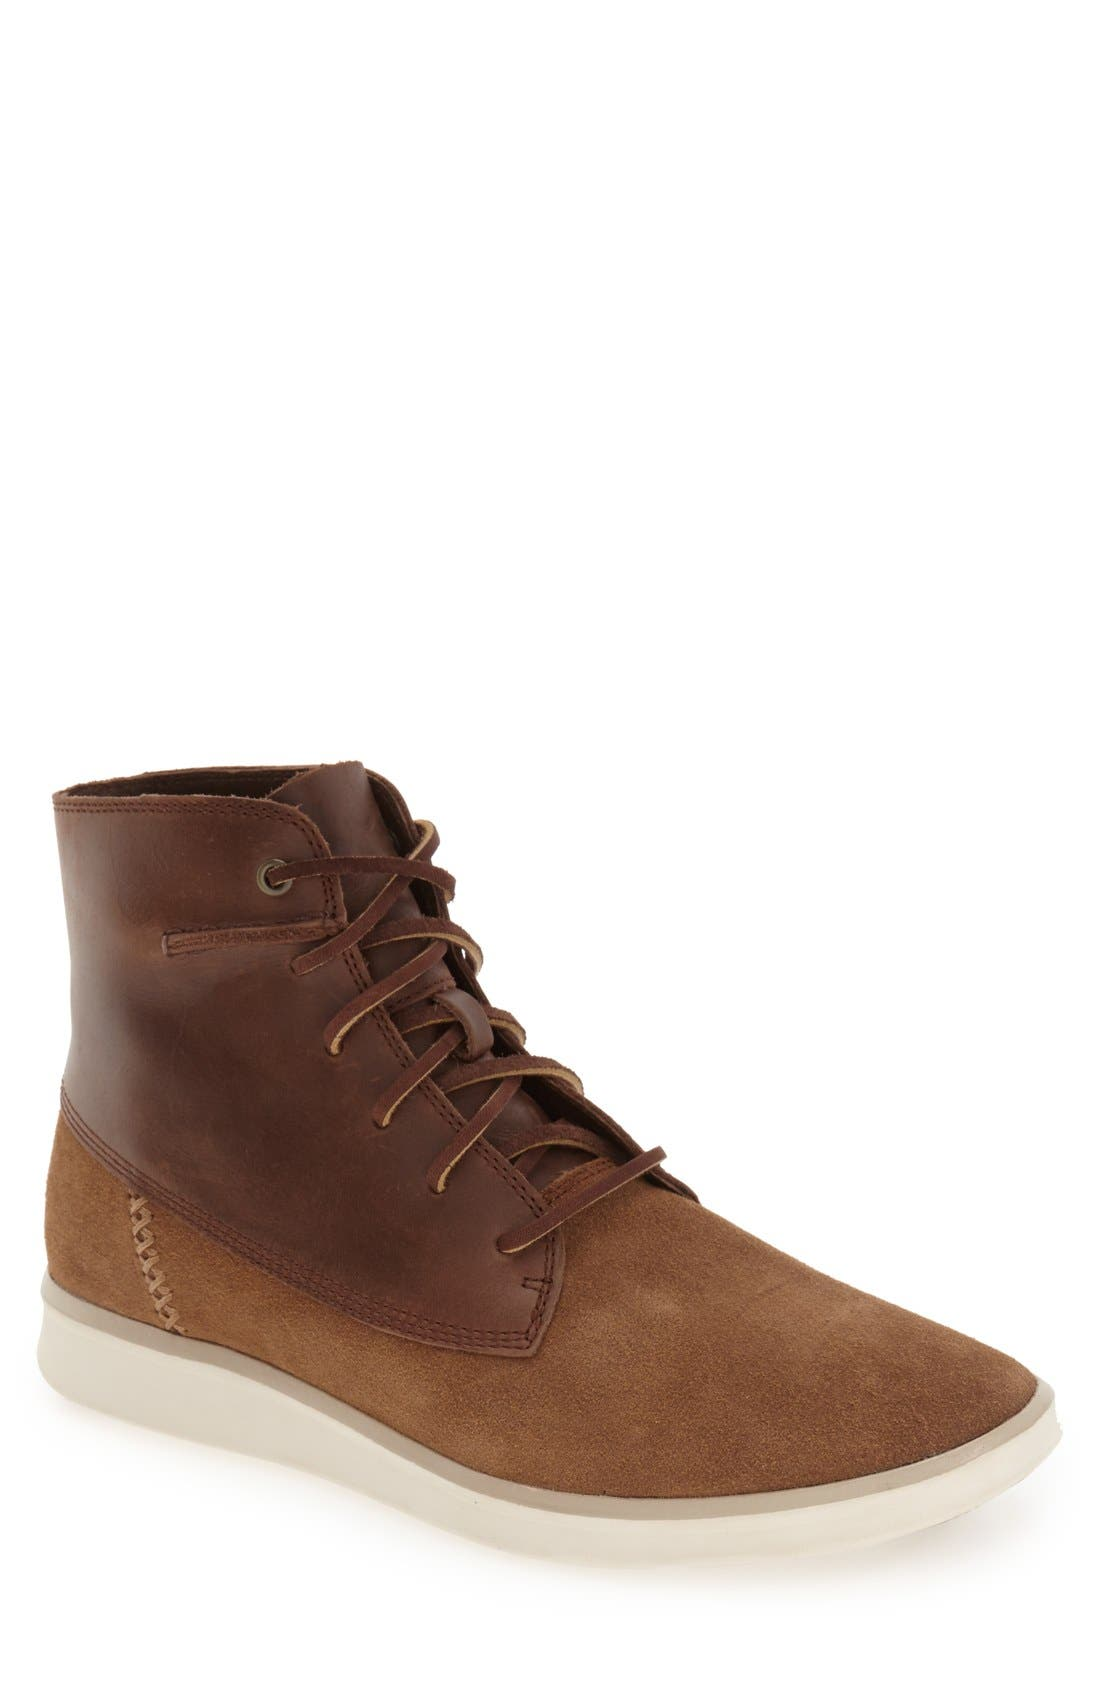 Alternate Image 1 Selected - UGG® 'Lamont' High Top Sneaker (Men)